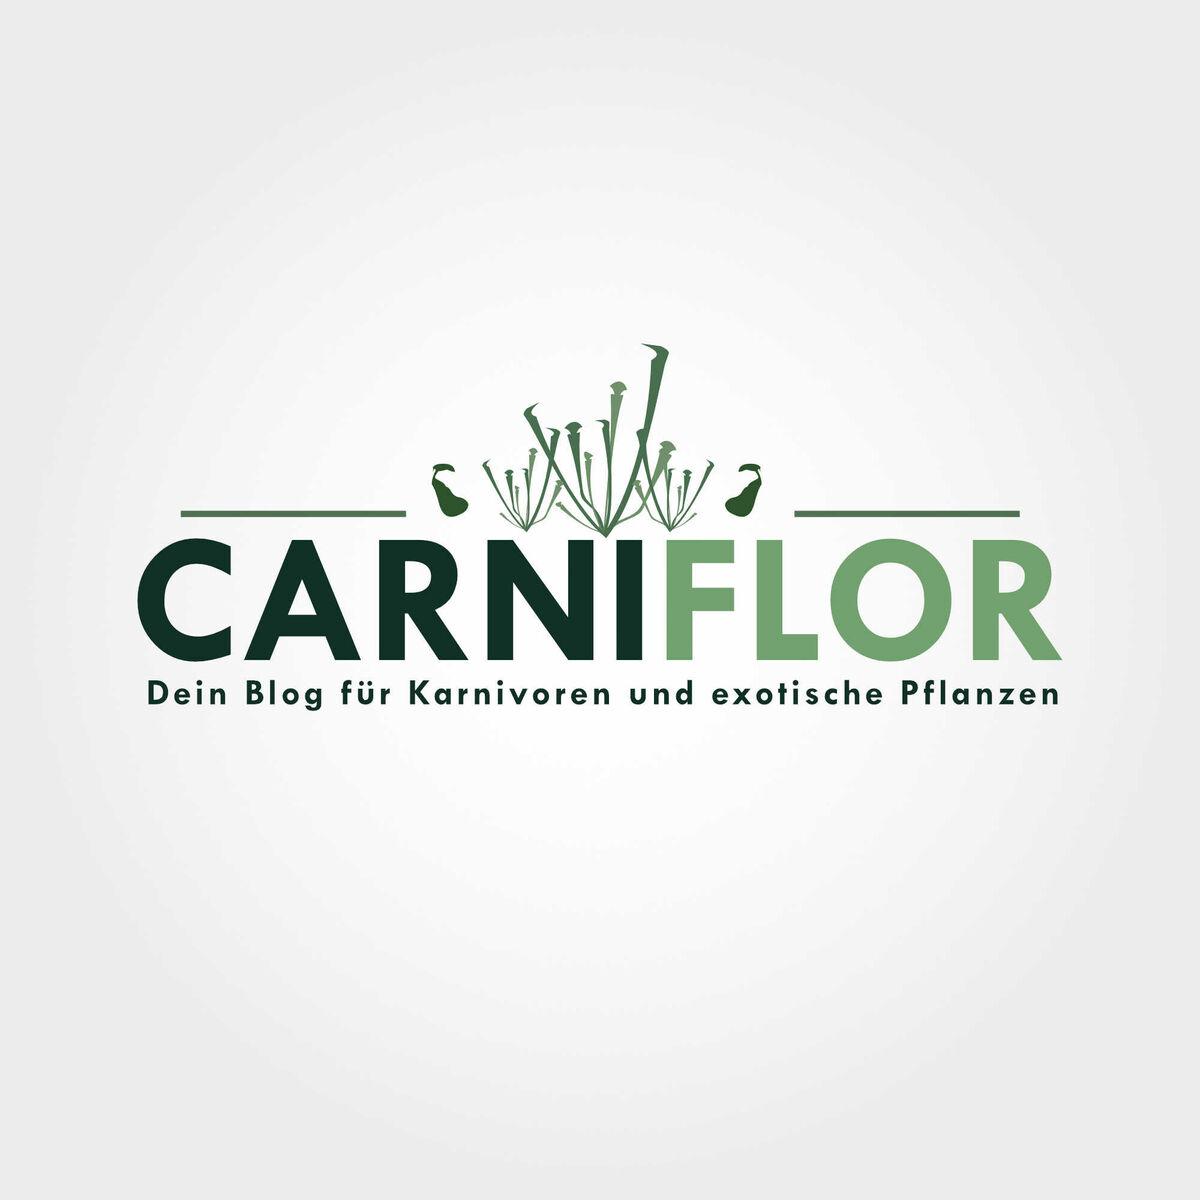 carniflor_logo_1-0.thumb.jpg.a16d3814b575a97ce76ee99451f7c8cc.jpg